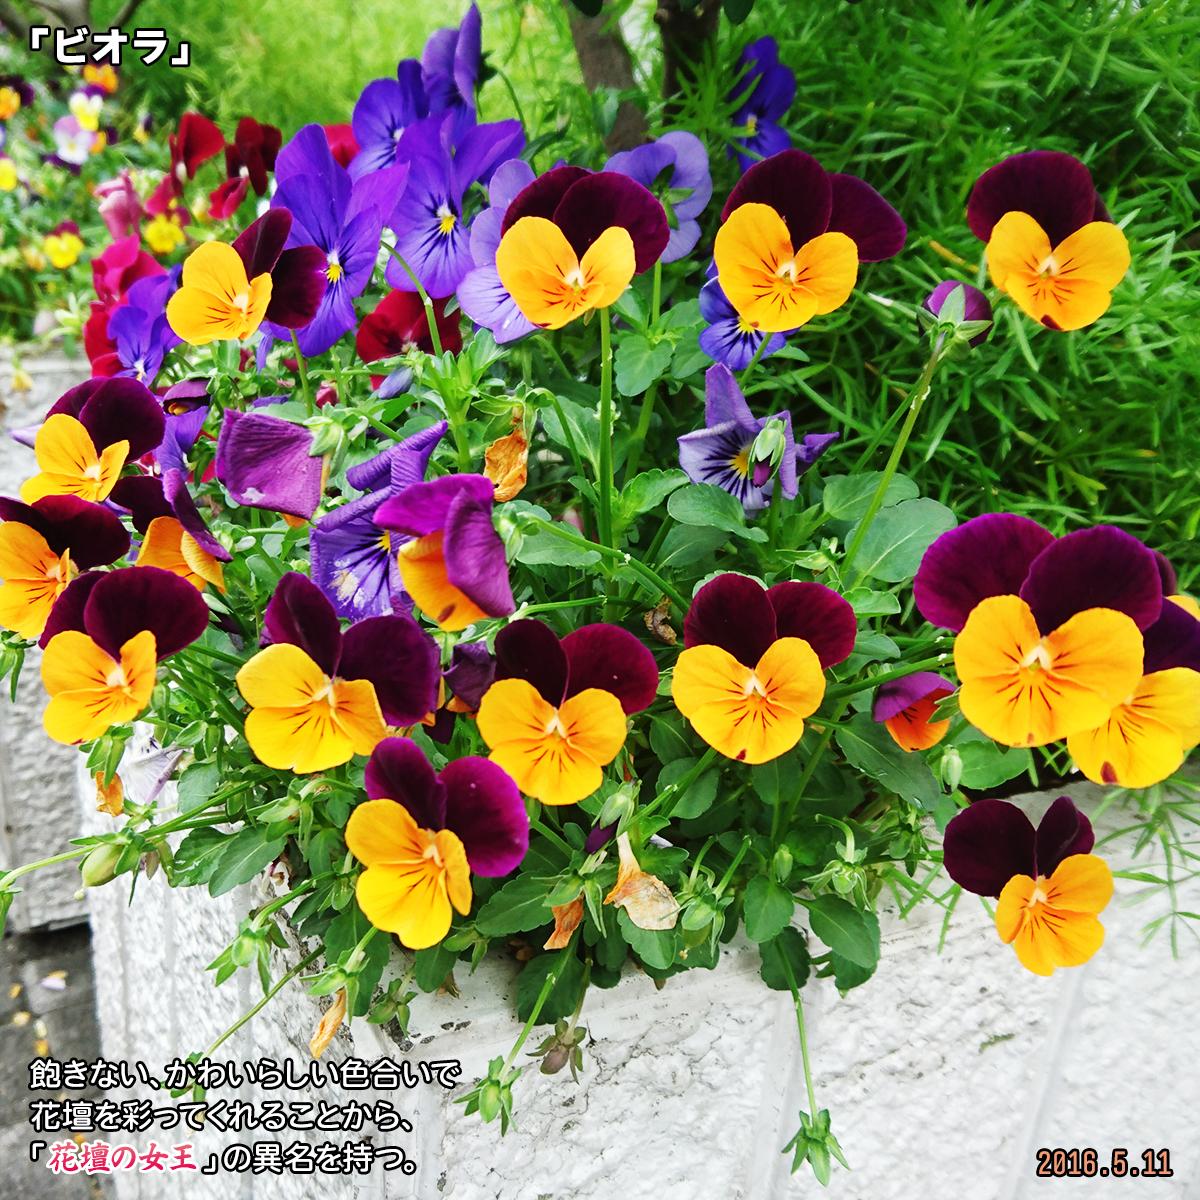 DSC_0682_201912181343391a1.jpg